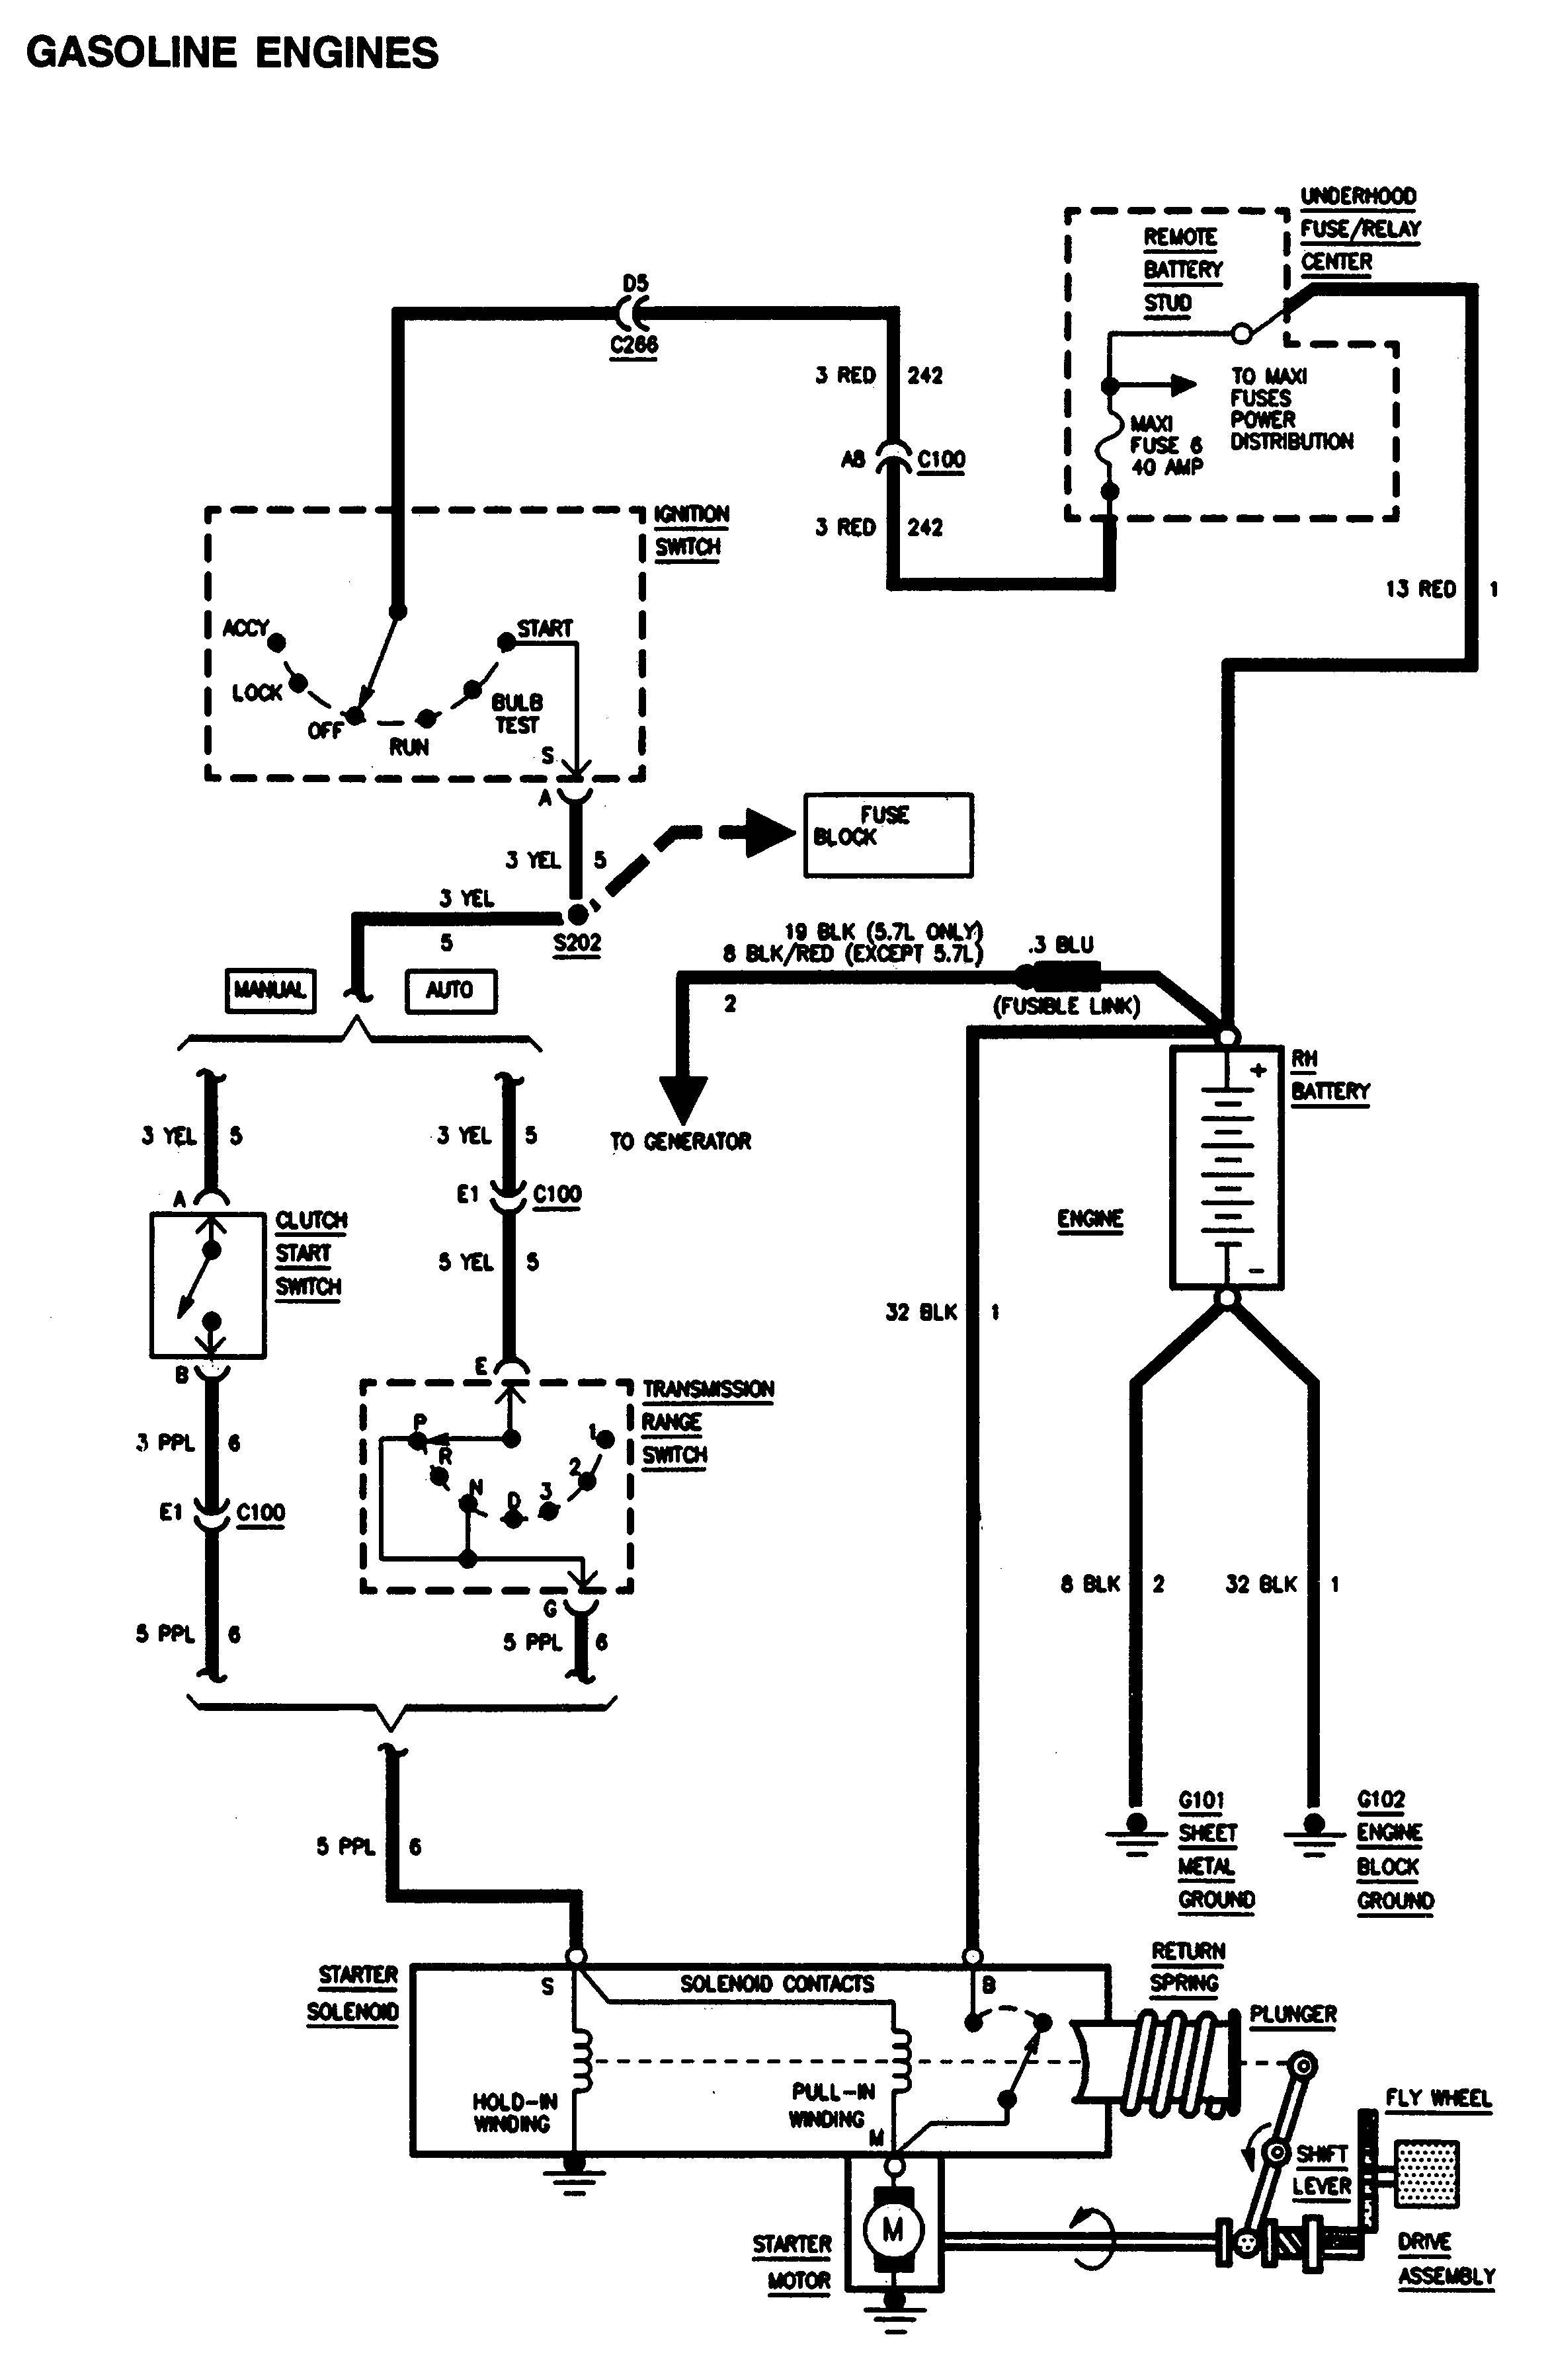 2004 Gmc Sierra 6.0 Tcm Wiring Diagram] Gmc Sierra 1500 Wiring Diagram Full Version Hd Of 2004 Gmc Sierra 6.0 Tcm Wiring